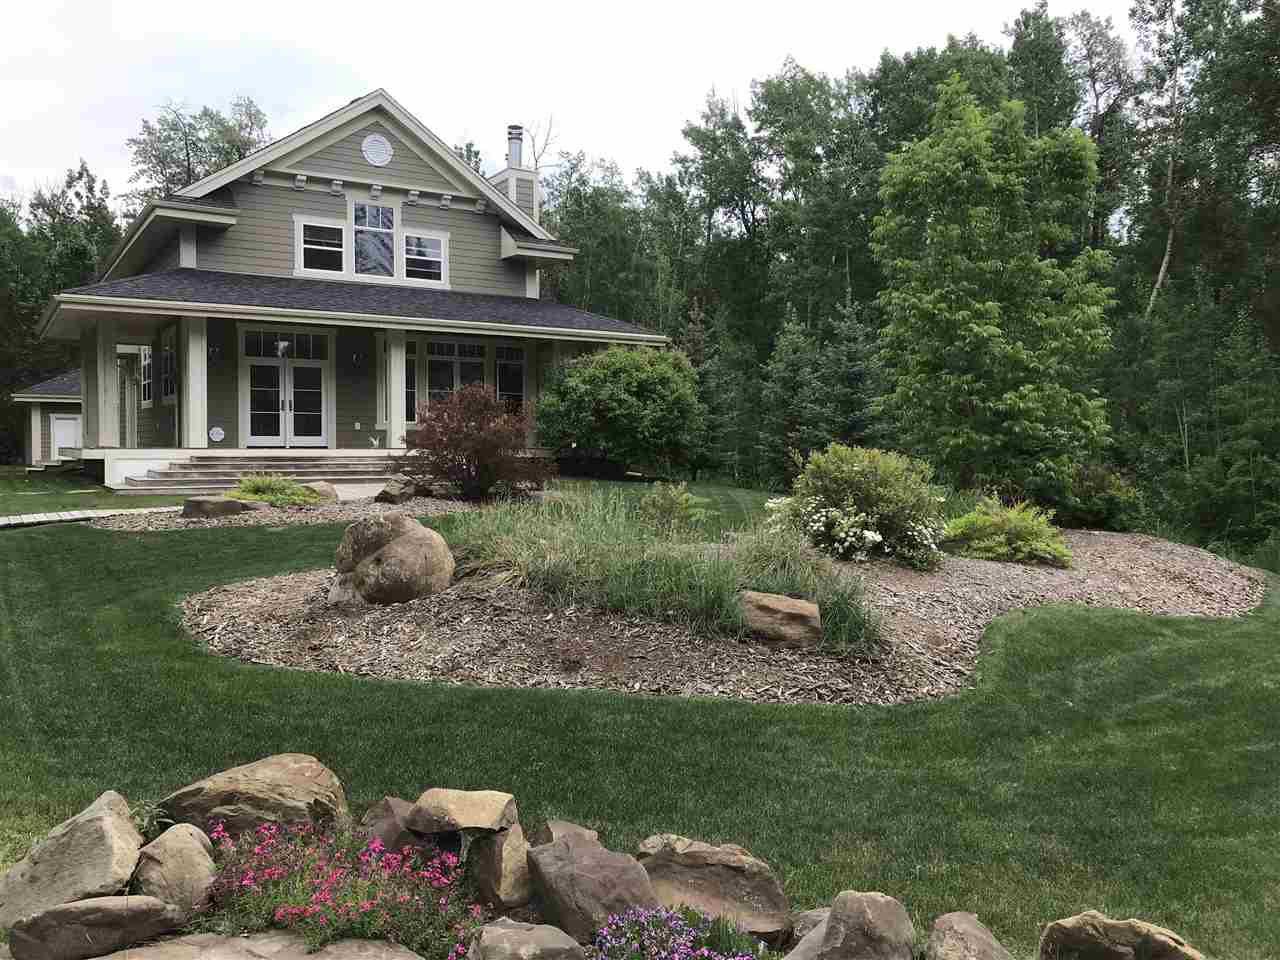 Main Photo: 90 Silver Beach Road: Rural Wetaskiwin County House for sale : MLS®# E4147276